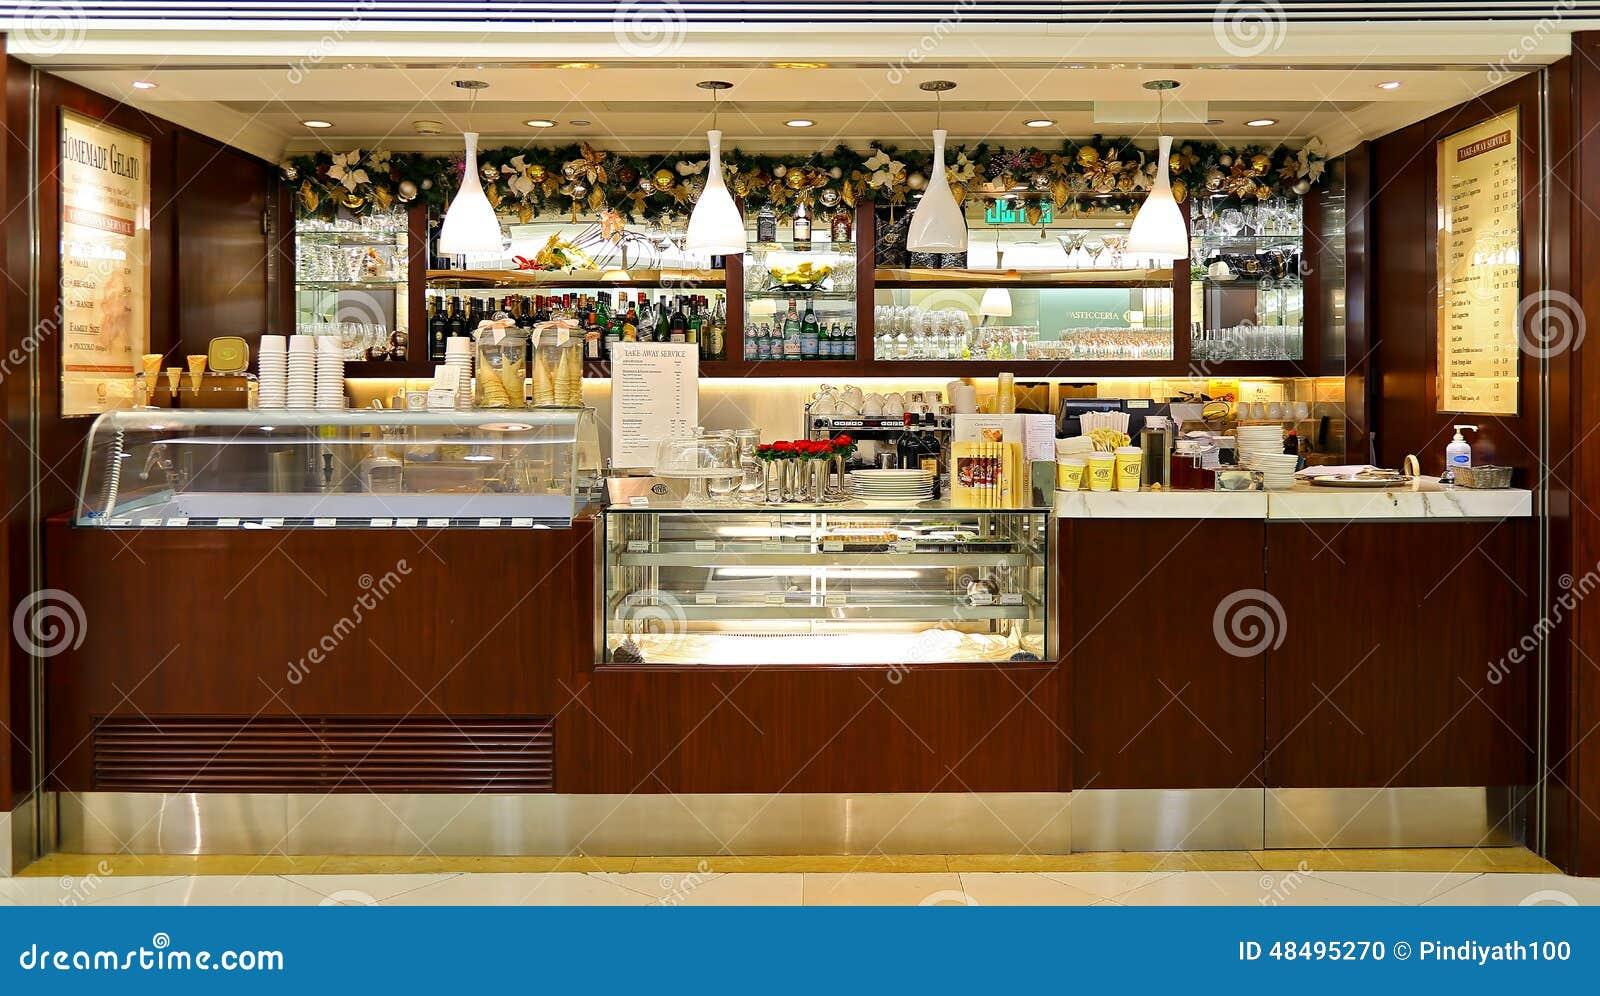 Cova Takeaway Coffee Bar Counter Editorial Image - Image: 48495270